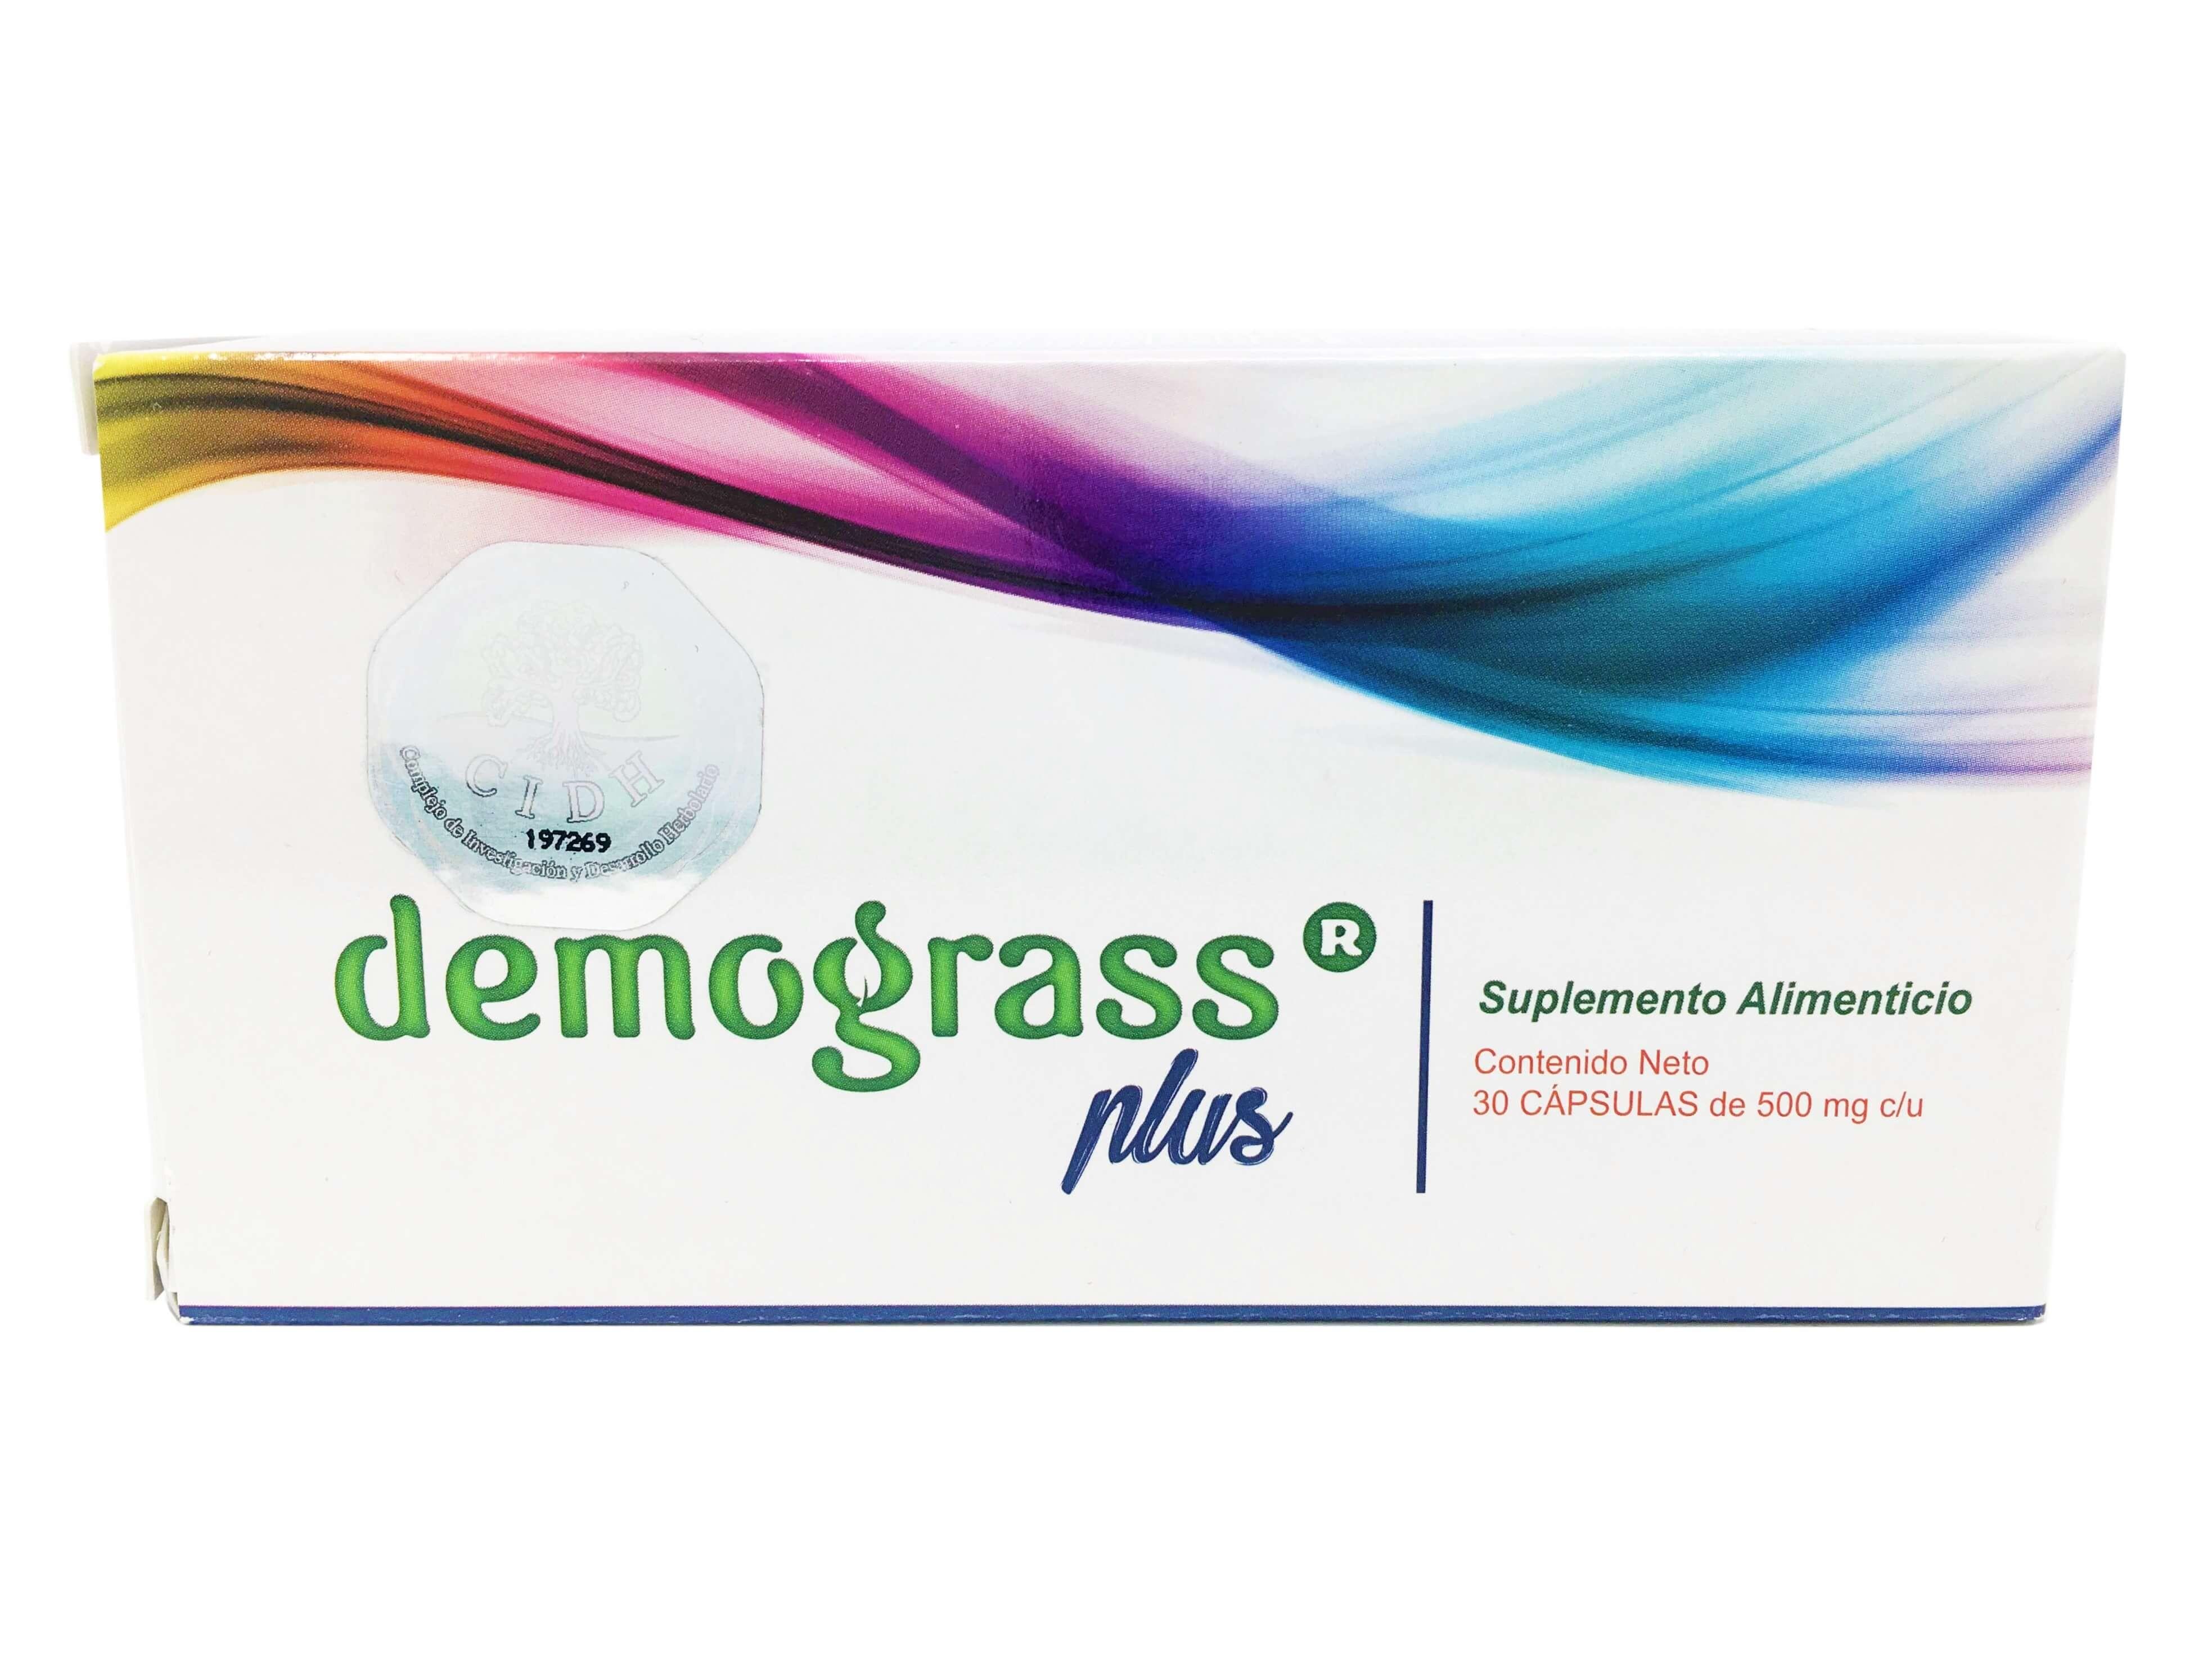 Demograss Plus en USA $9.99 Free Shipping Original